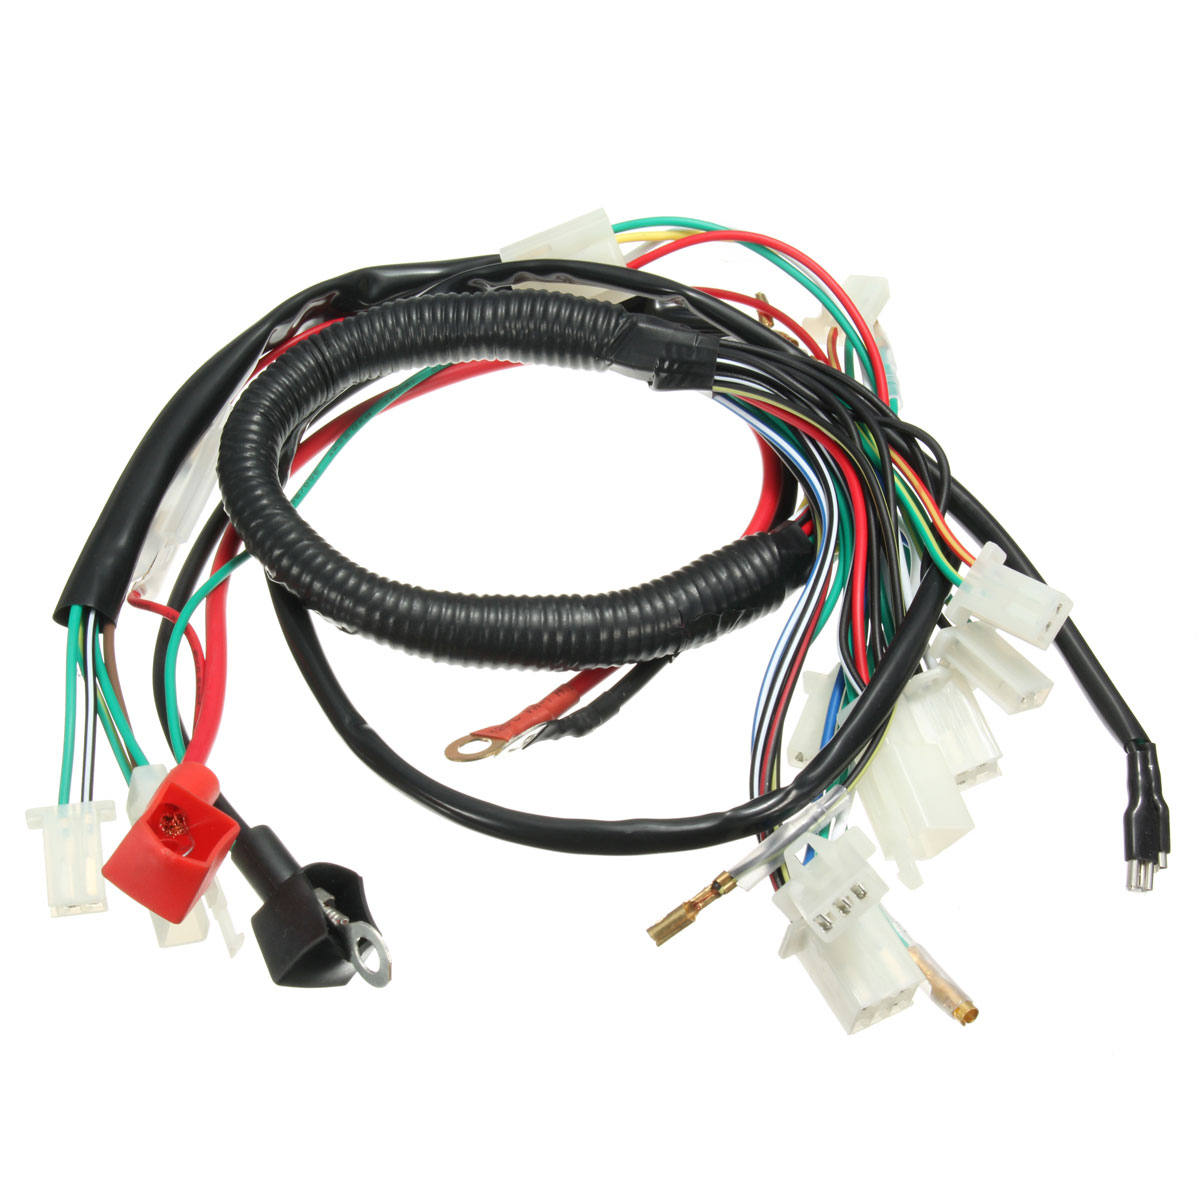 Pit Bike Wiring Diagram Electric Start Atx 450w Smps Circuit Harness Machine Loom